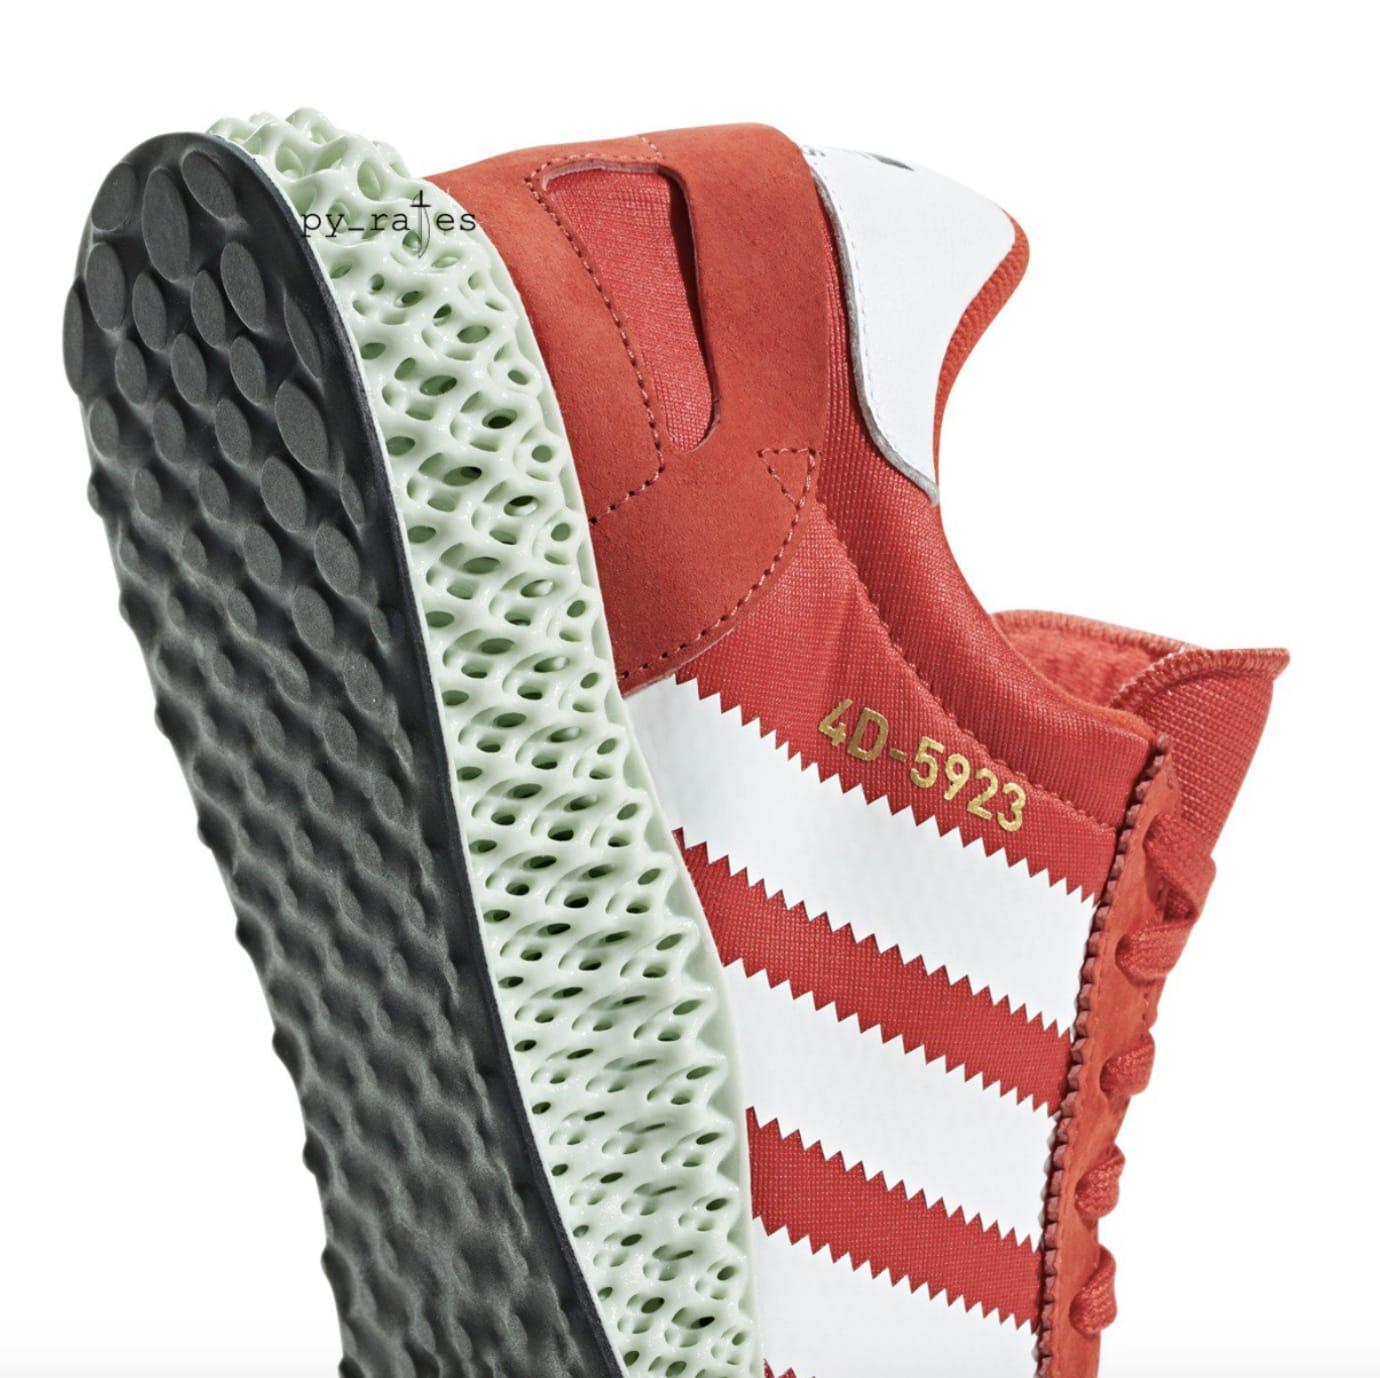 huge discount 26b28 beb9d Image via pyrates · Adidas 4D-5923 RedWhite (Heel)